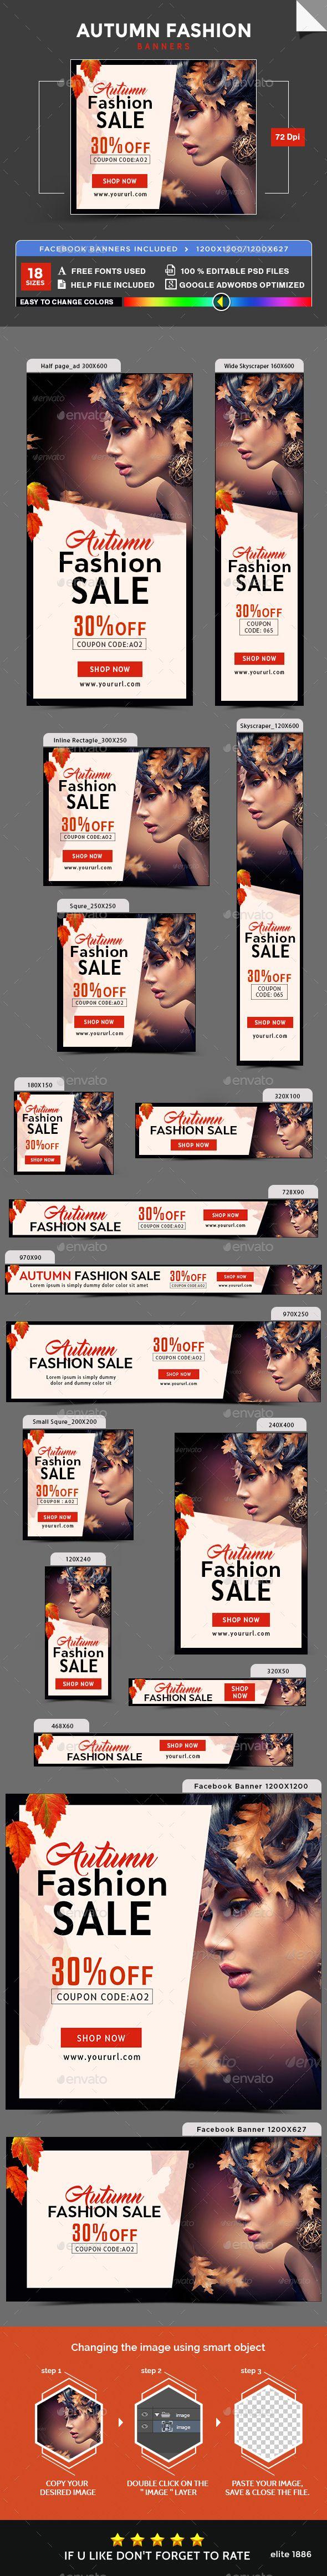 Autumn Fashion Sale Banners  — PSD Template #studio #web banner • Download ➝ https://graphicriver.net/item/autumn-fashion-sale-banners/18285788?ref=pxcr